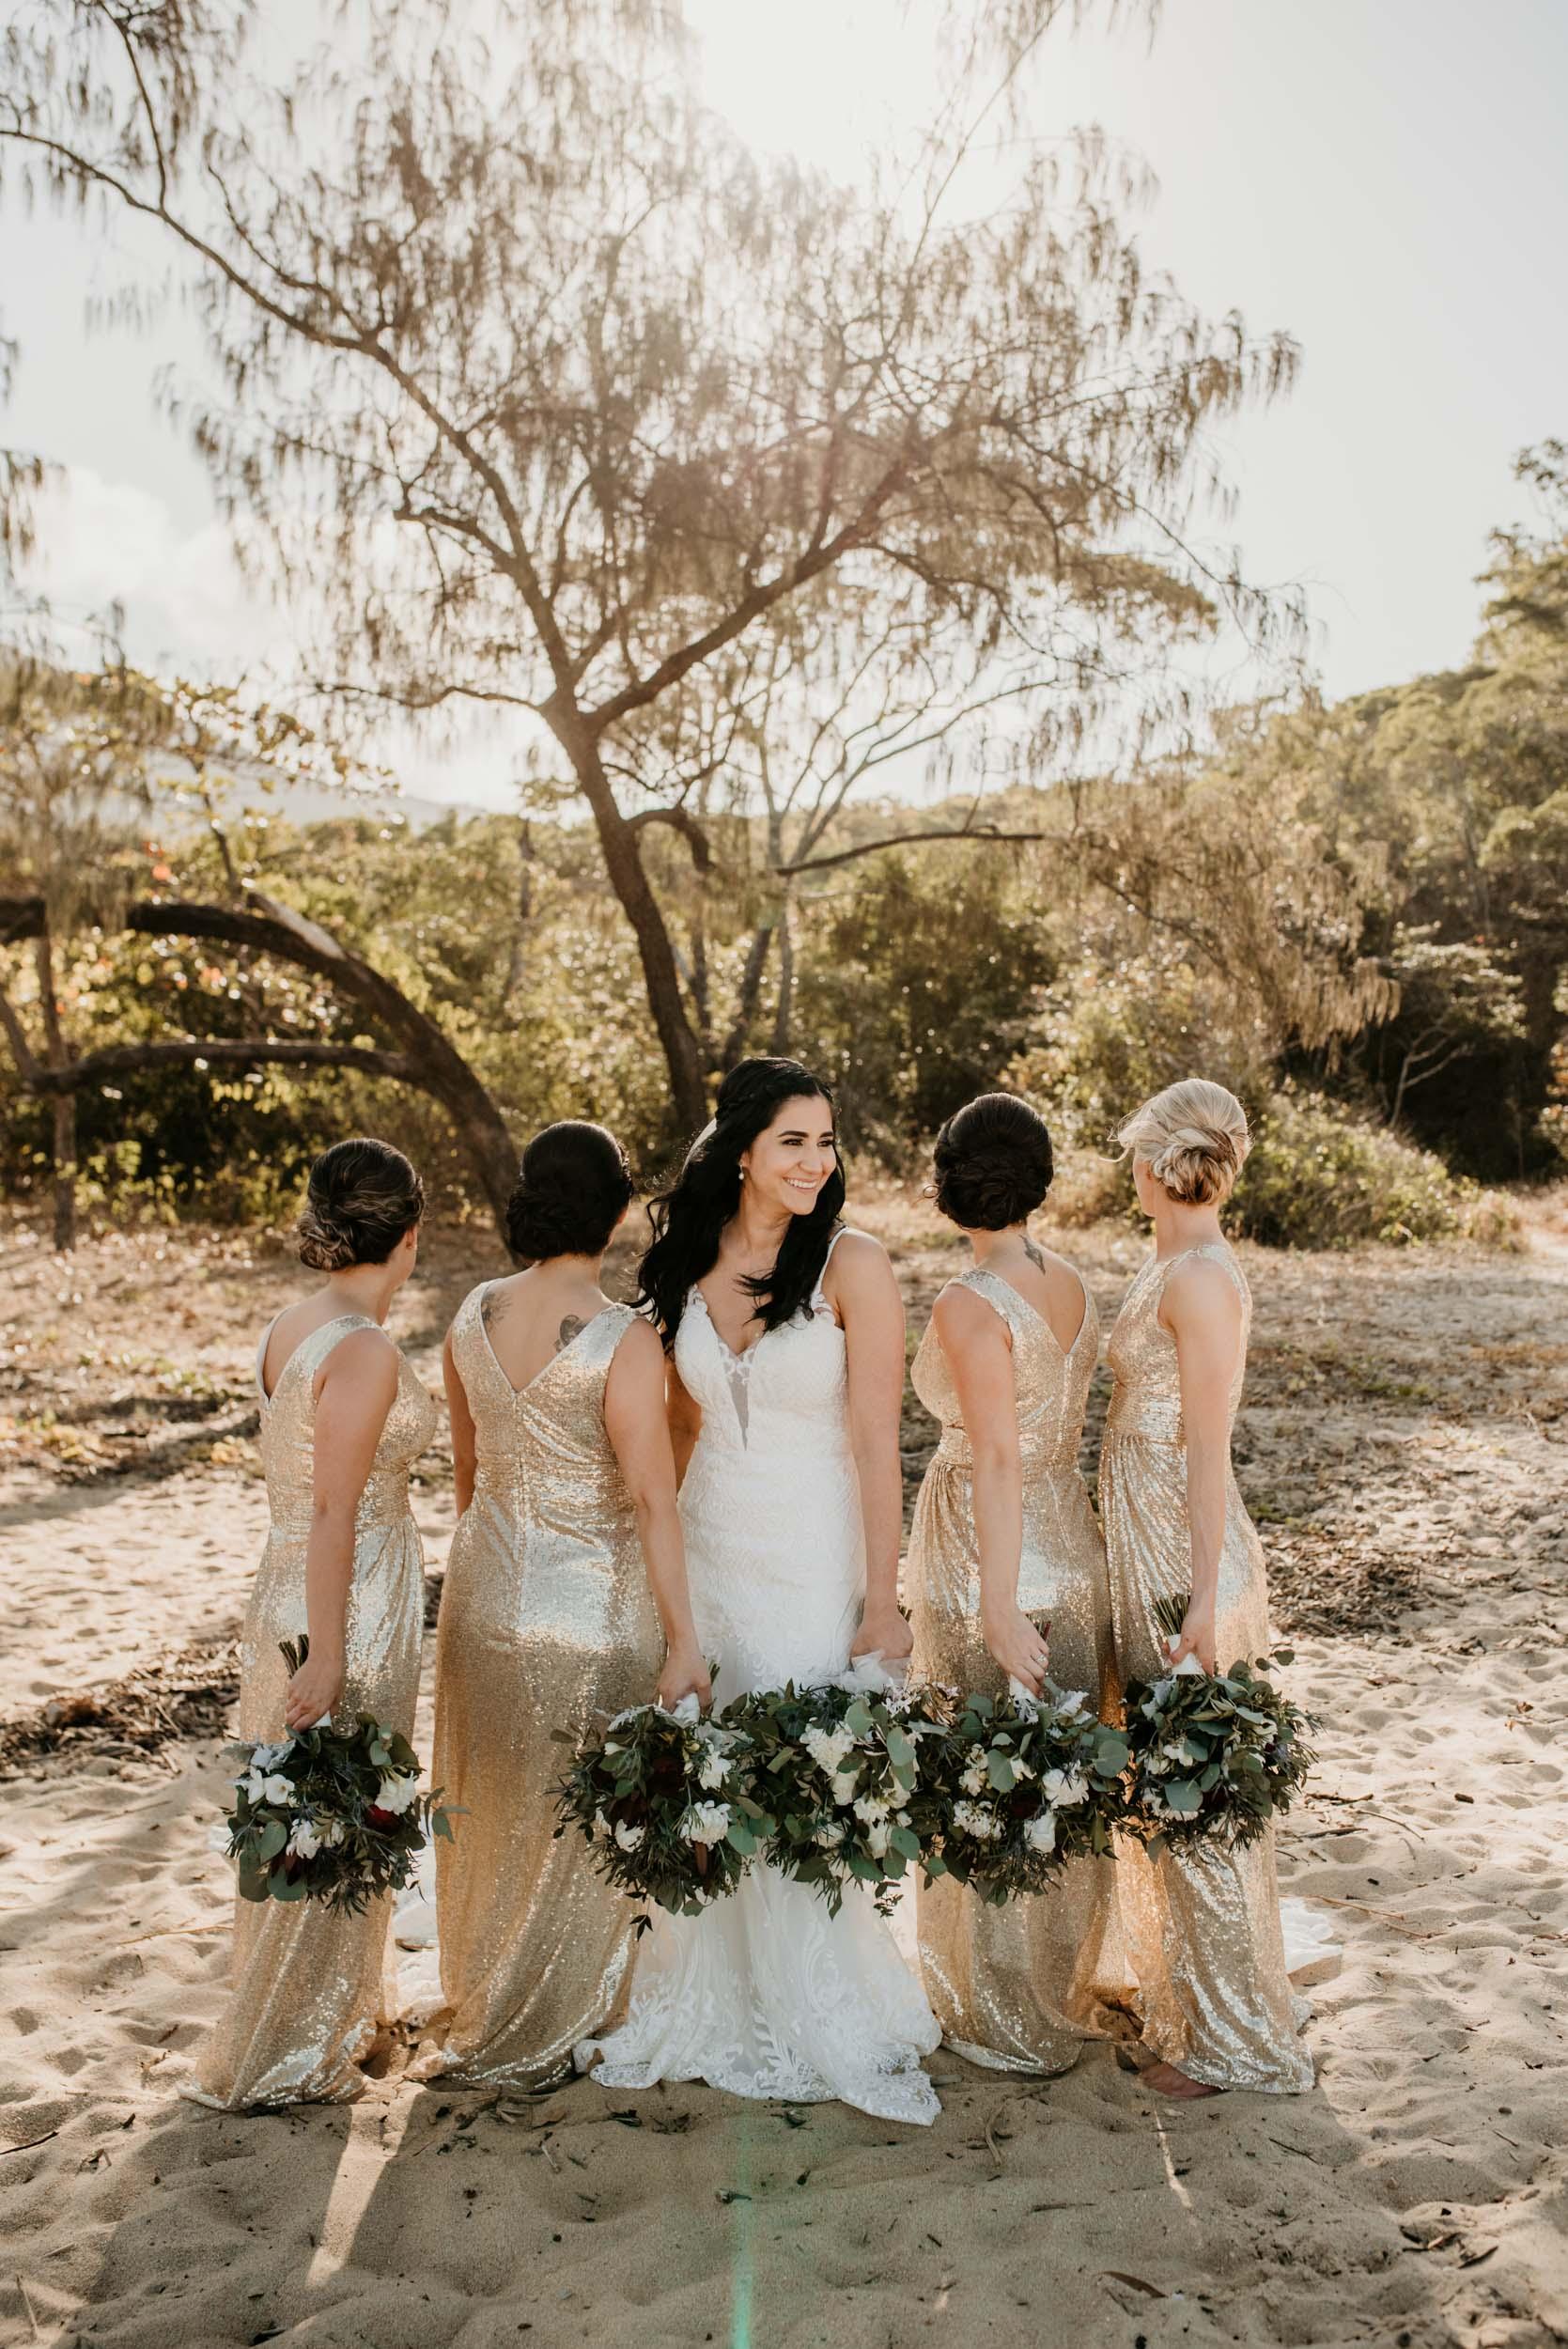 The Raw Photographer - Cairns Wedding Photographer - Beach Palm Cove Ceremony - Dress Irene Costa's Devine Bridal - Queensland-44.jpg